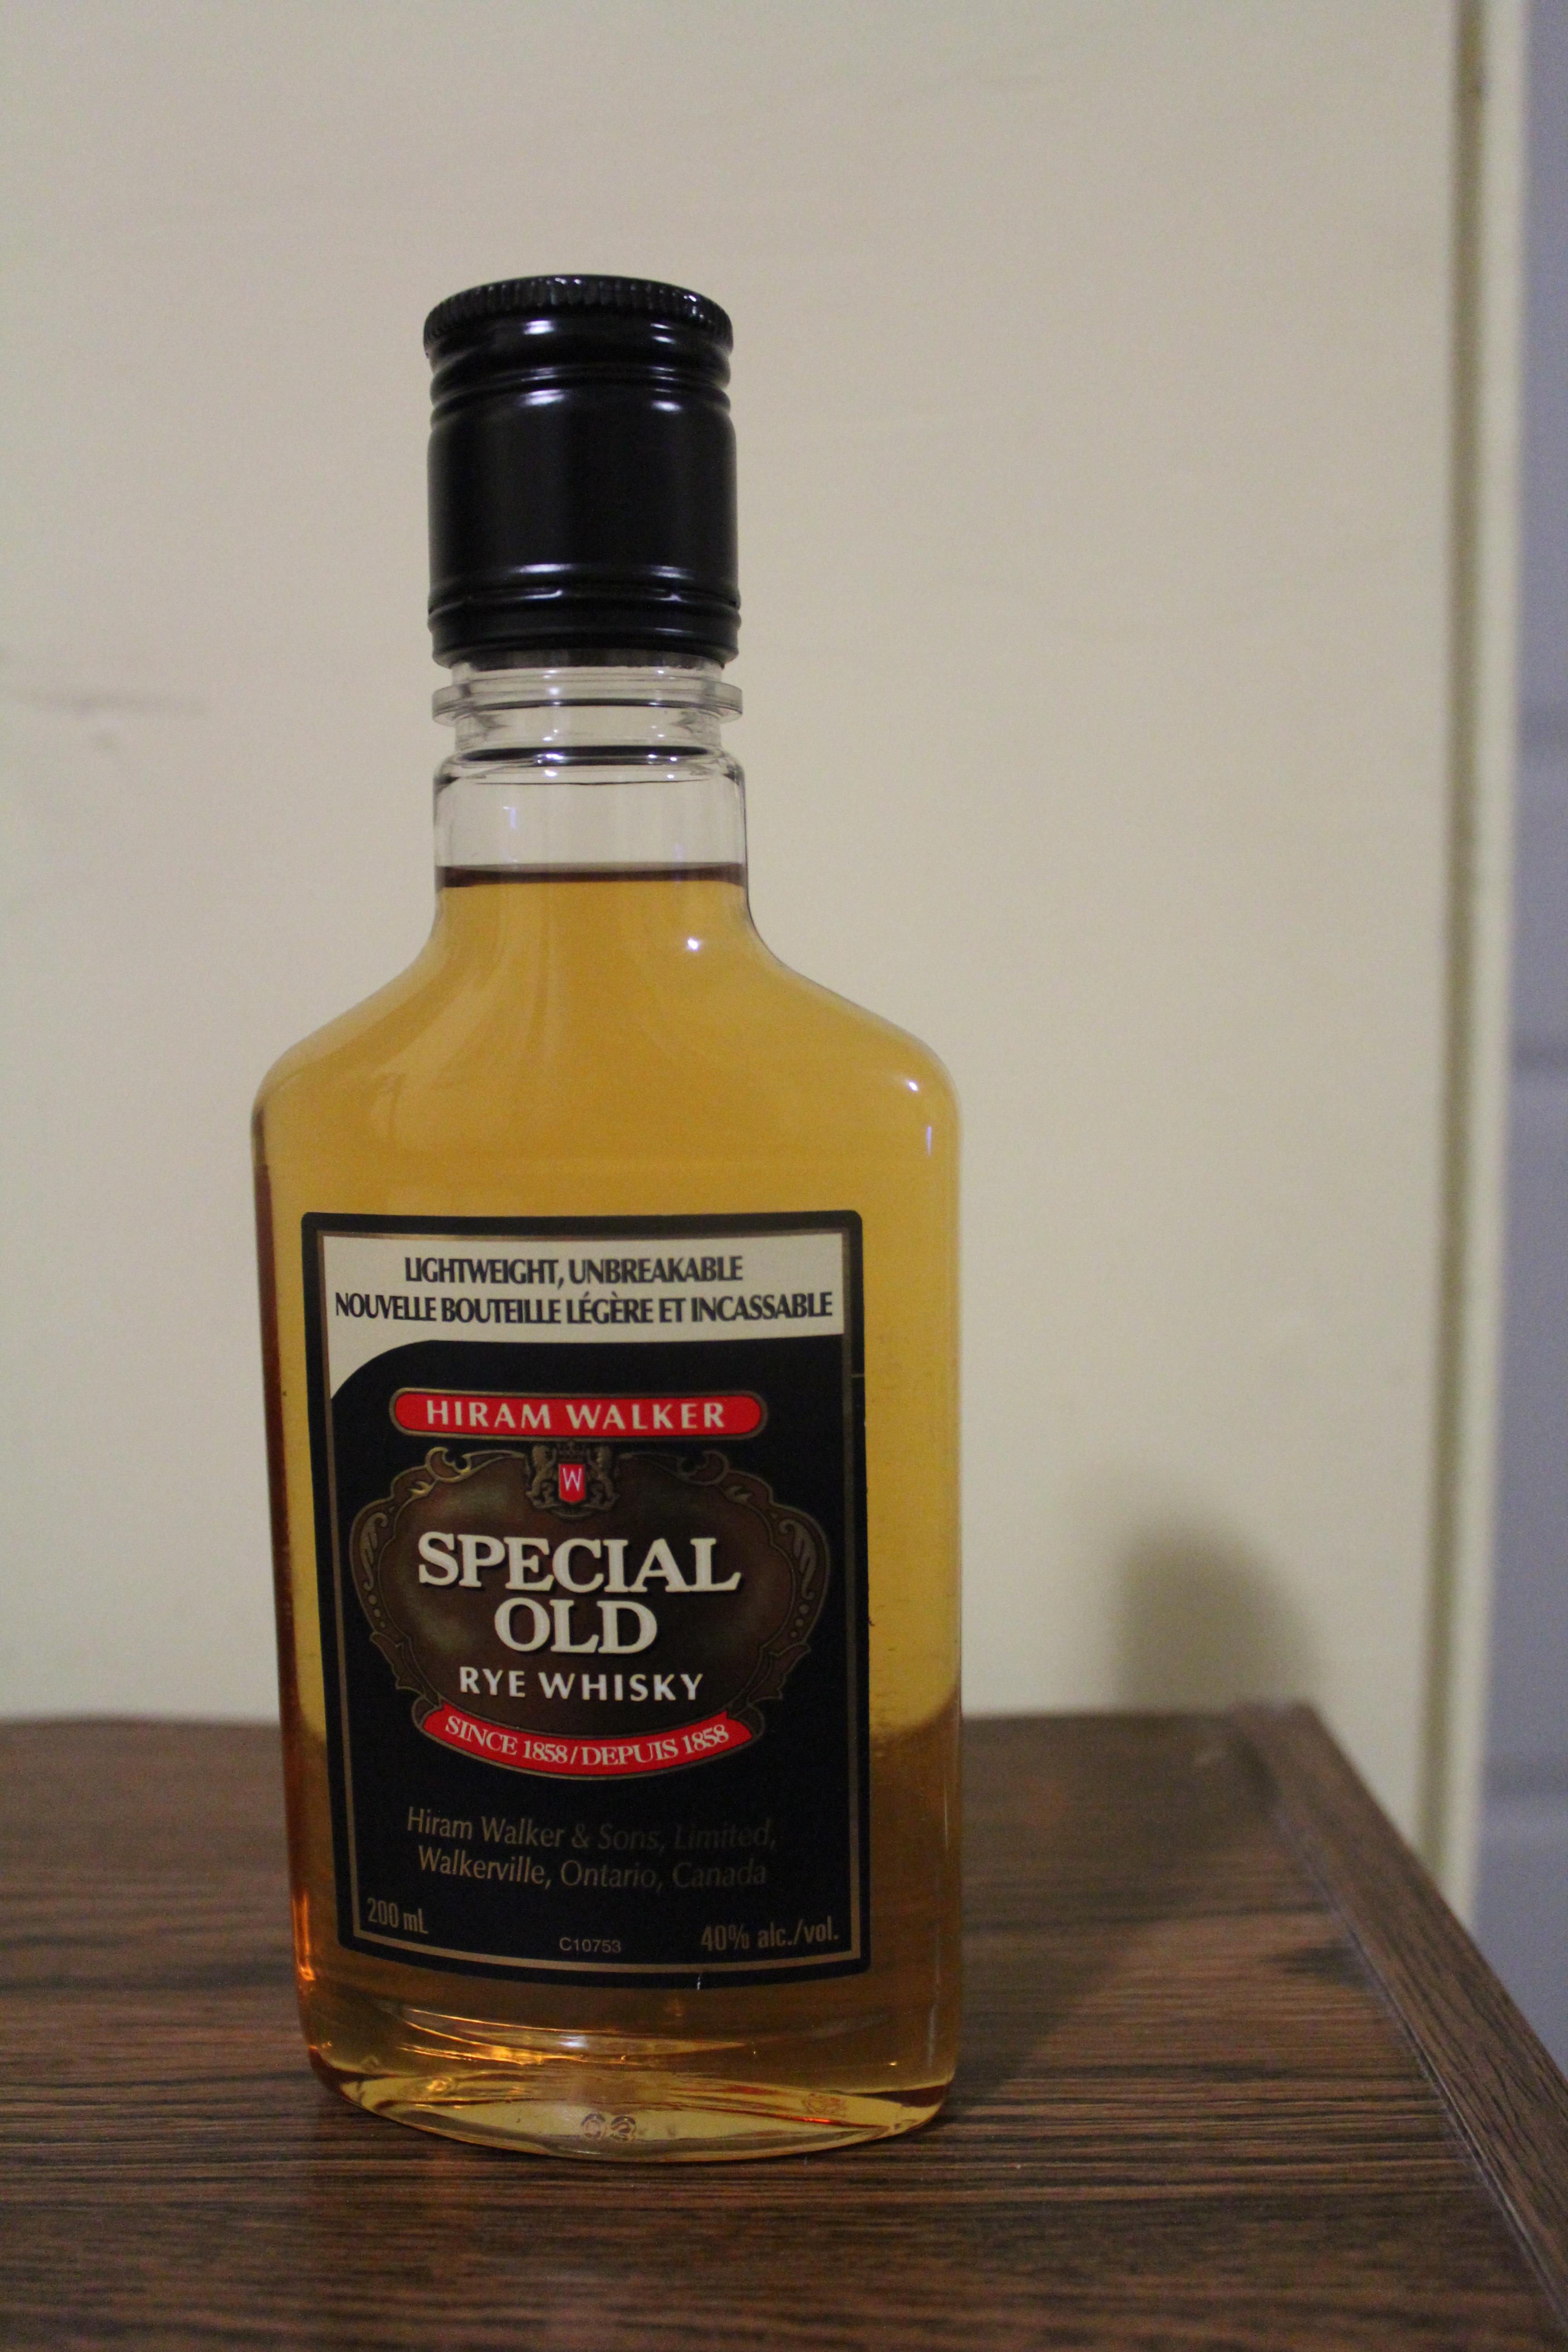 Hiram Walker Special Old Rye Whisky with Dan & Ryan